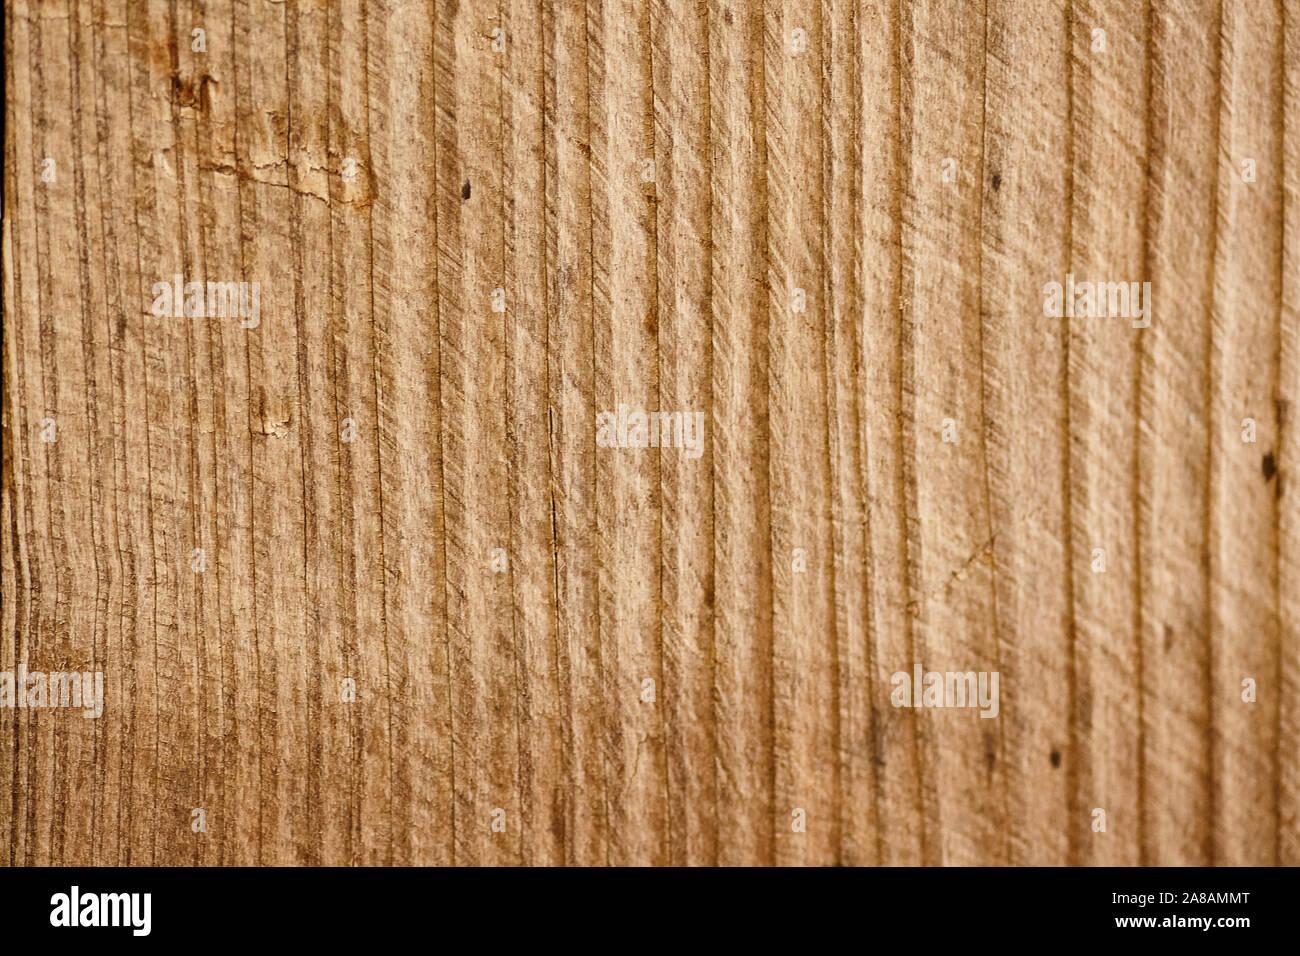 Superficie de madera #2 Foto de stock